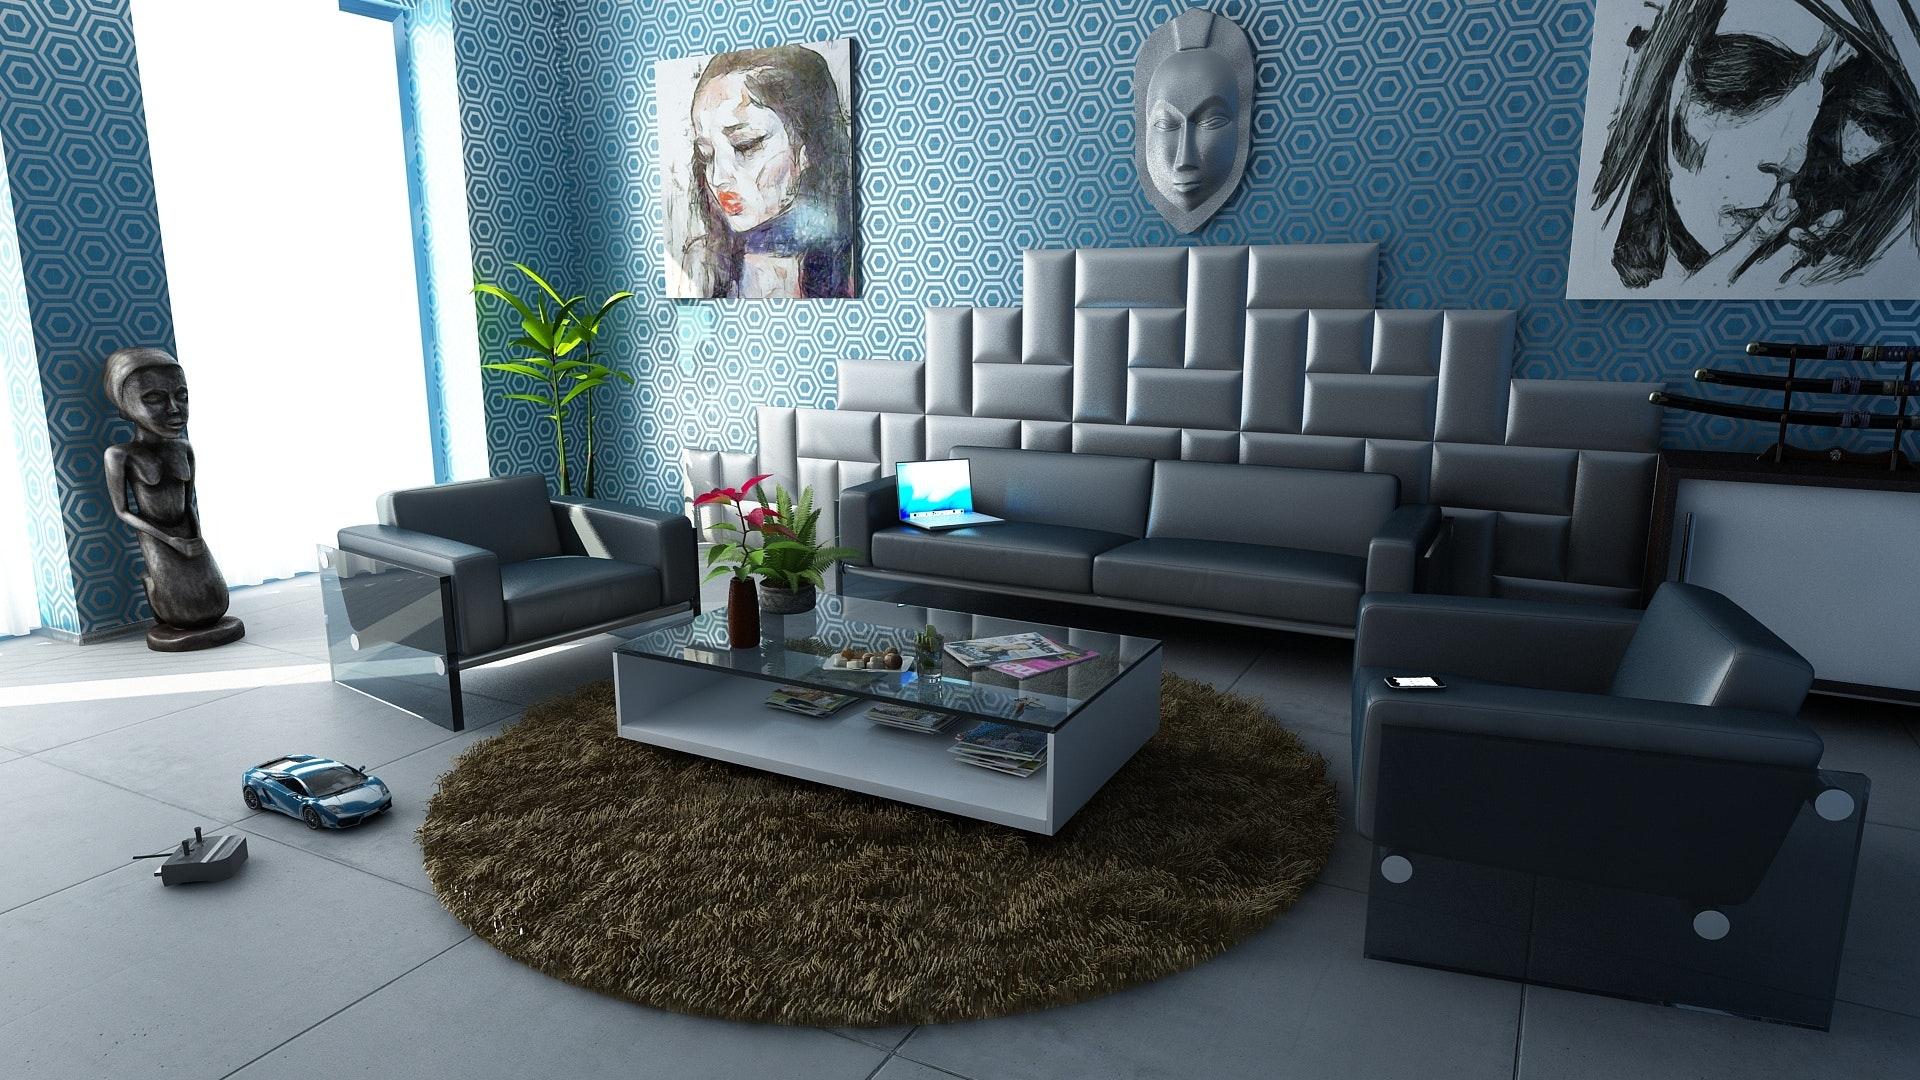 apartment-architecture-armchair-chair-271805